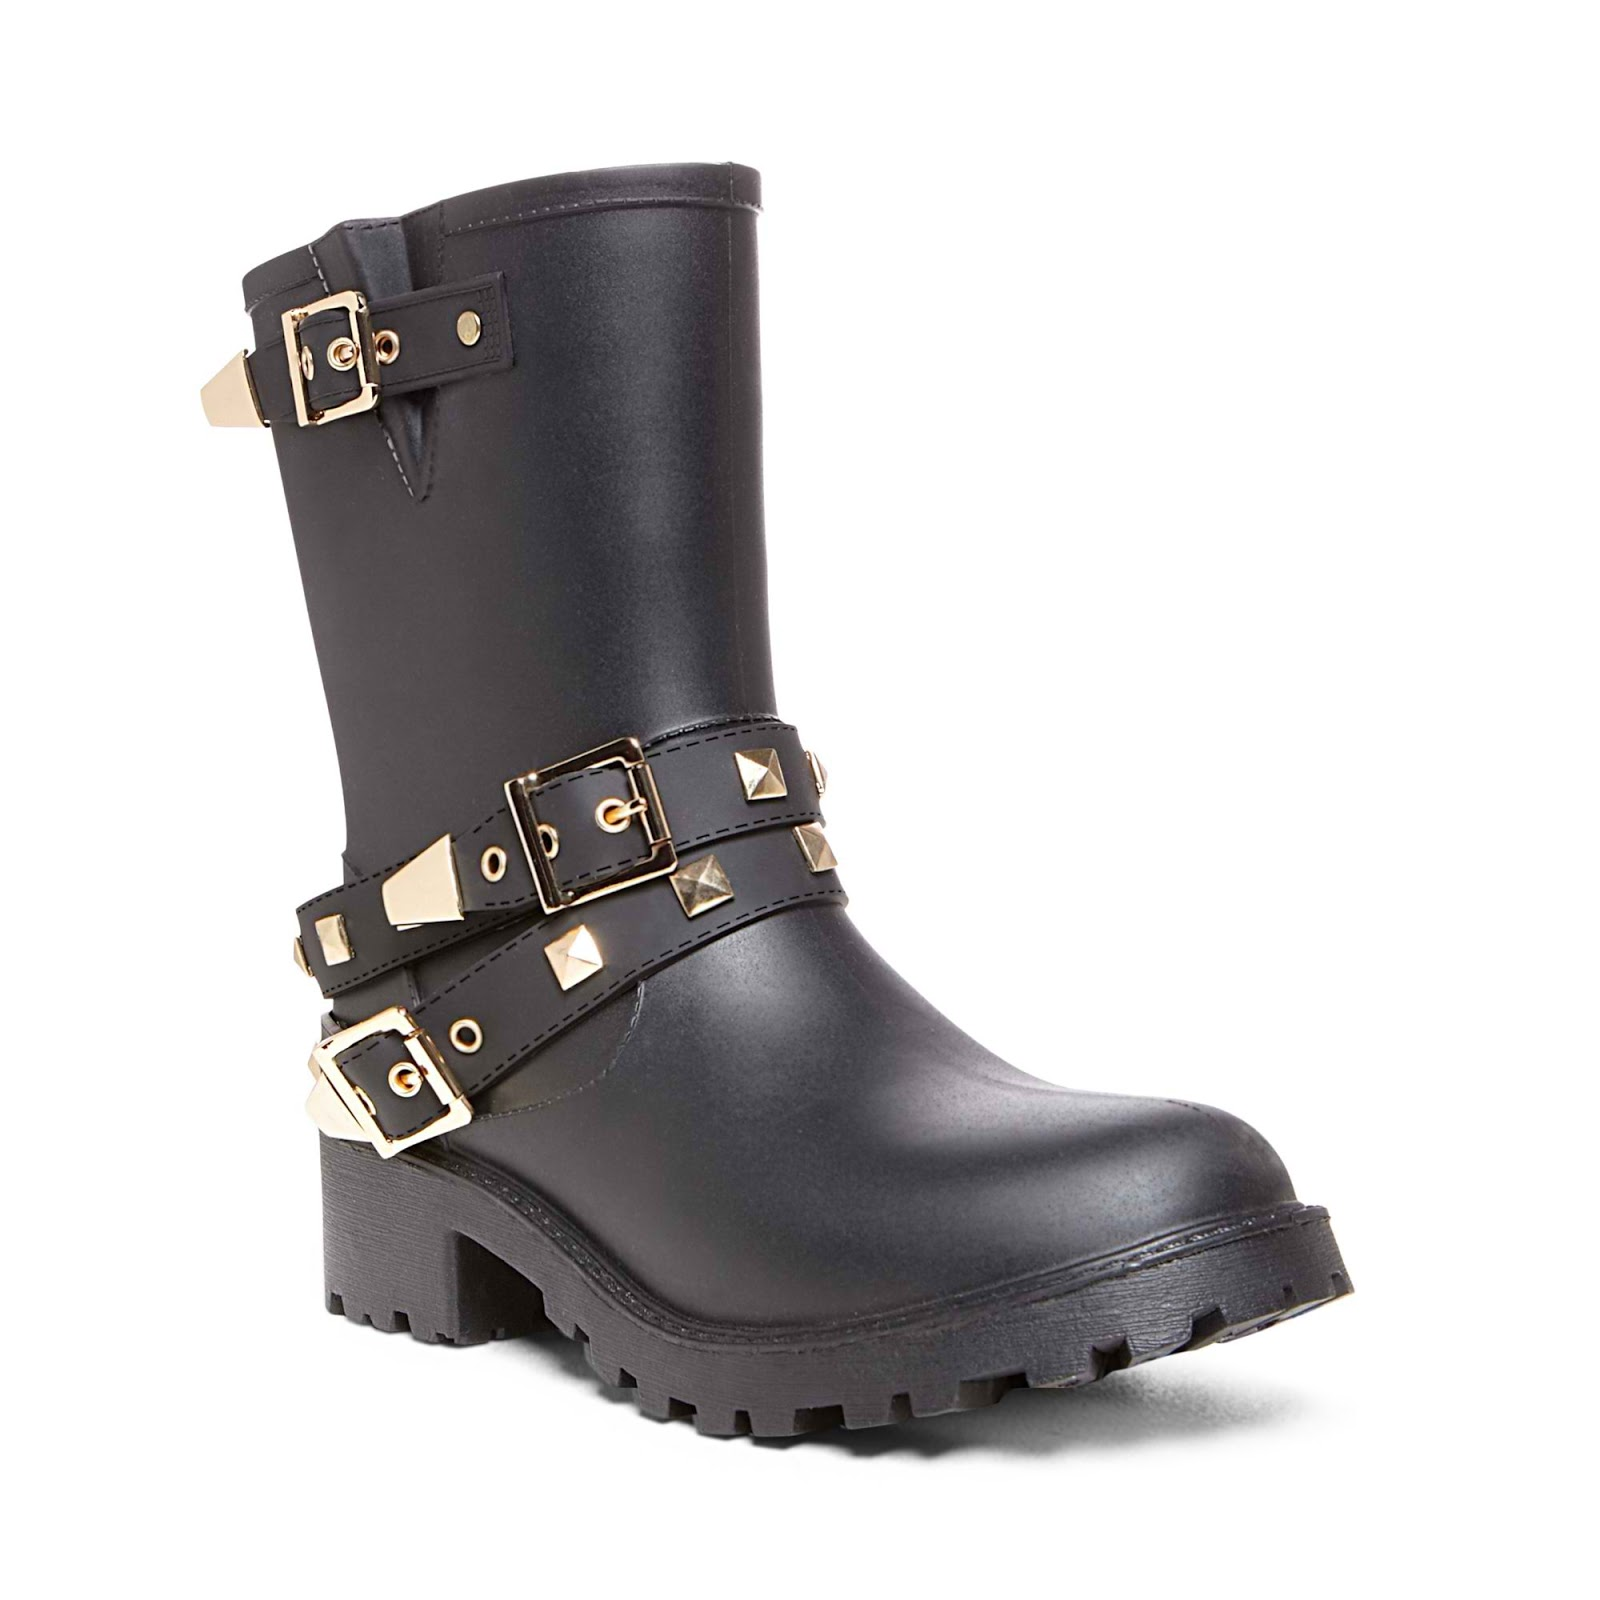 2260f69ee4 Δες κάποια από τα νέα Παπούτσια που θα βρεις την επόμενη σεζόν Φθινόπωρο  Χειμώνας 2013-2014 στην NAK